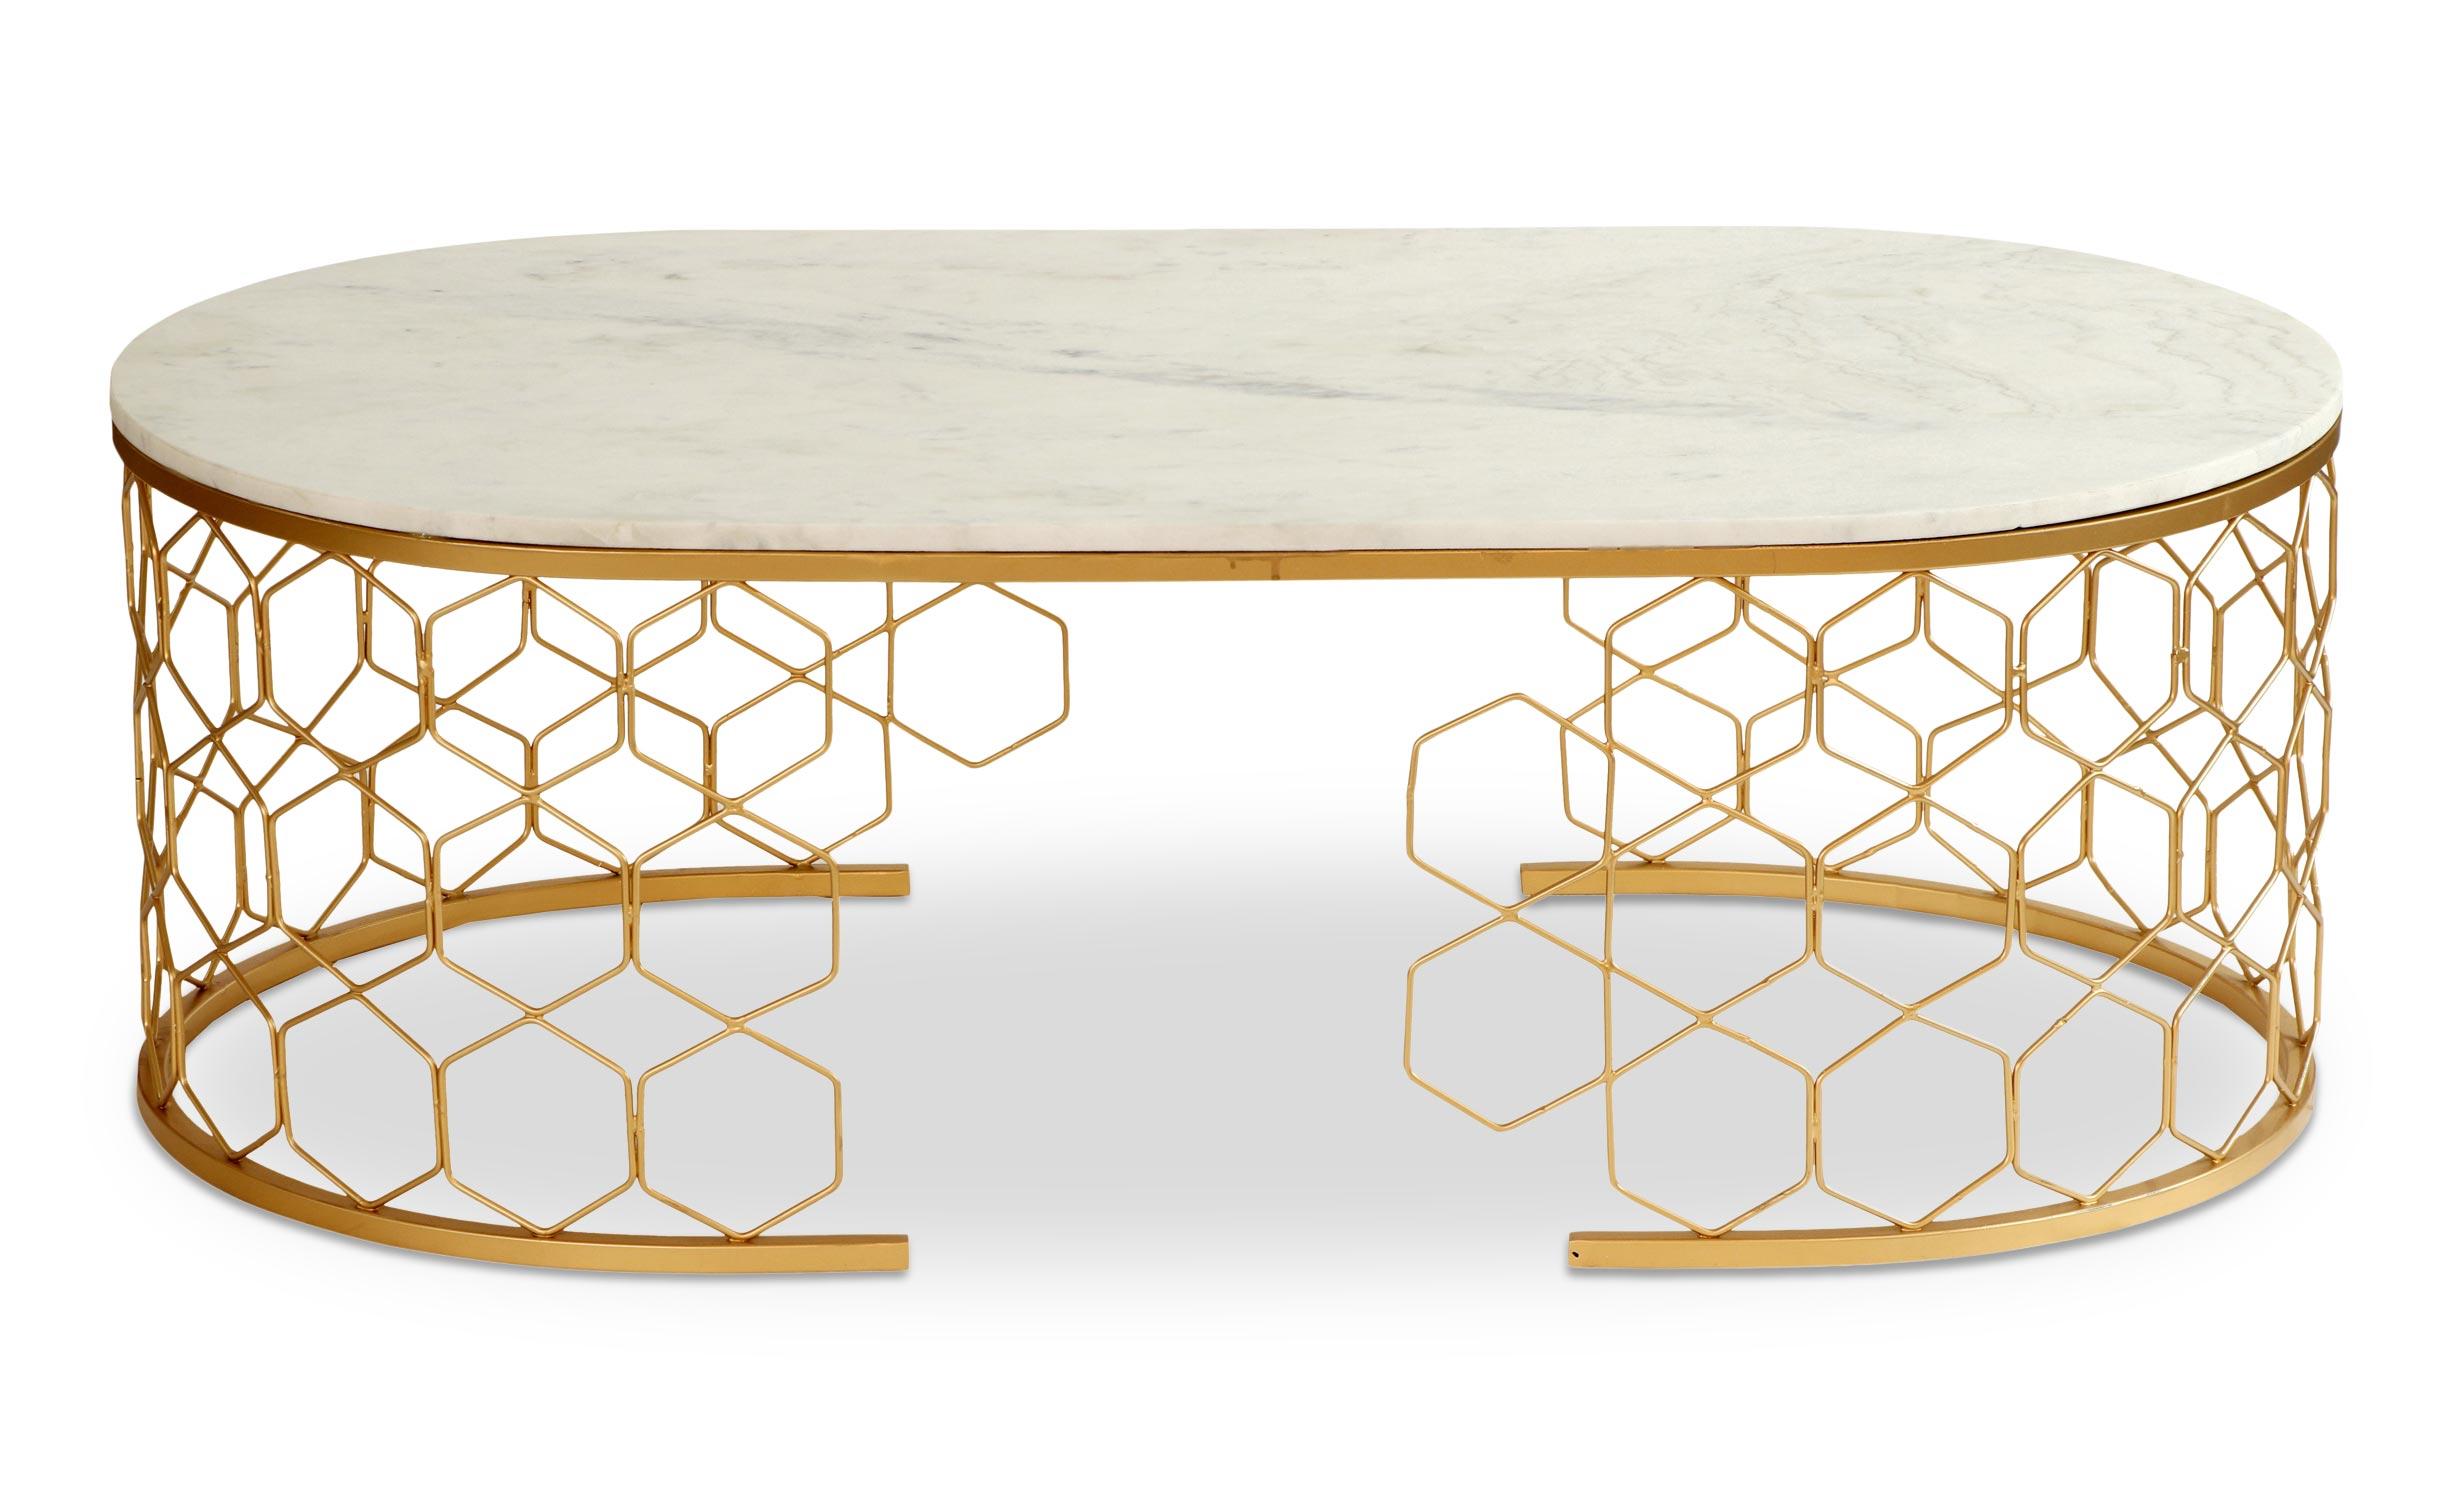 Mayano design salontafel van marmer en goudkleurig metaal